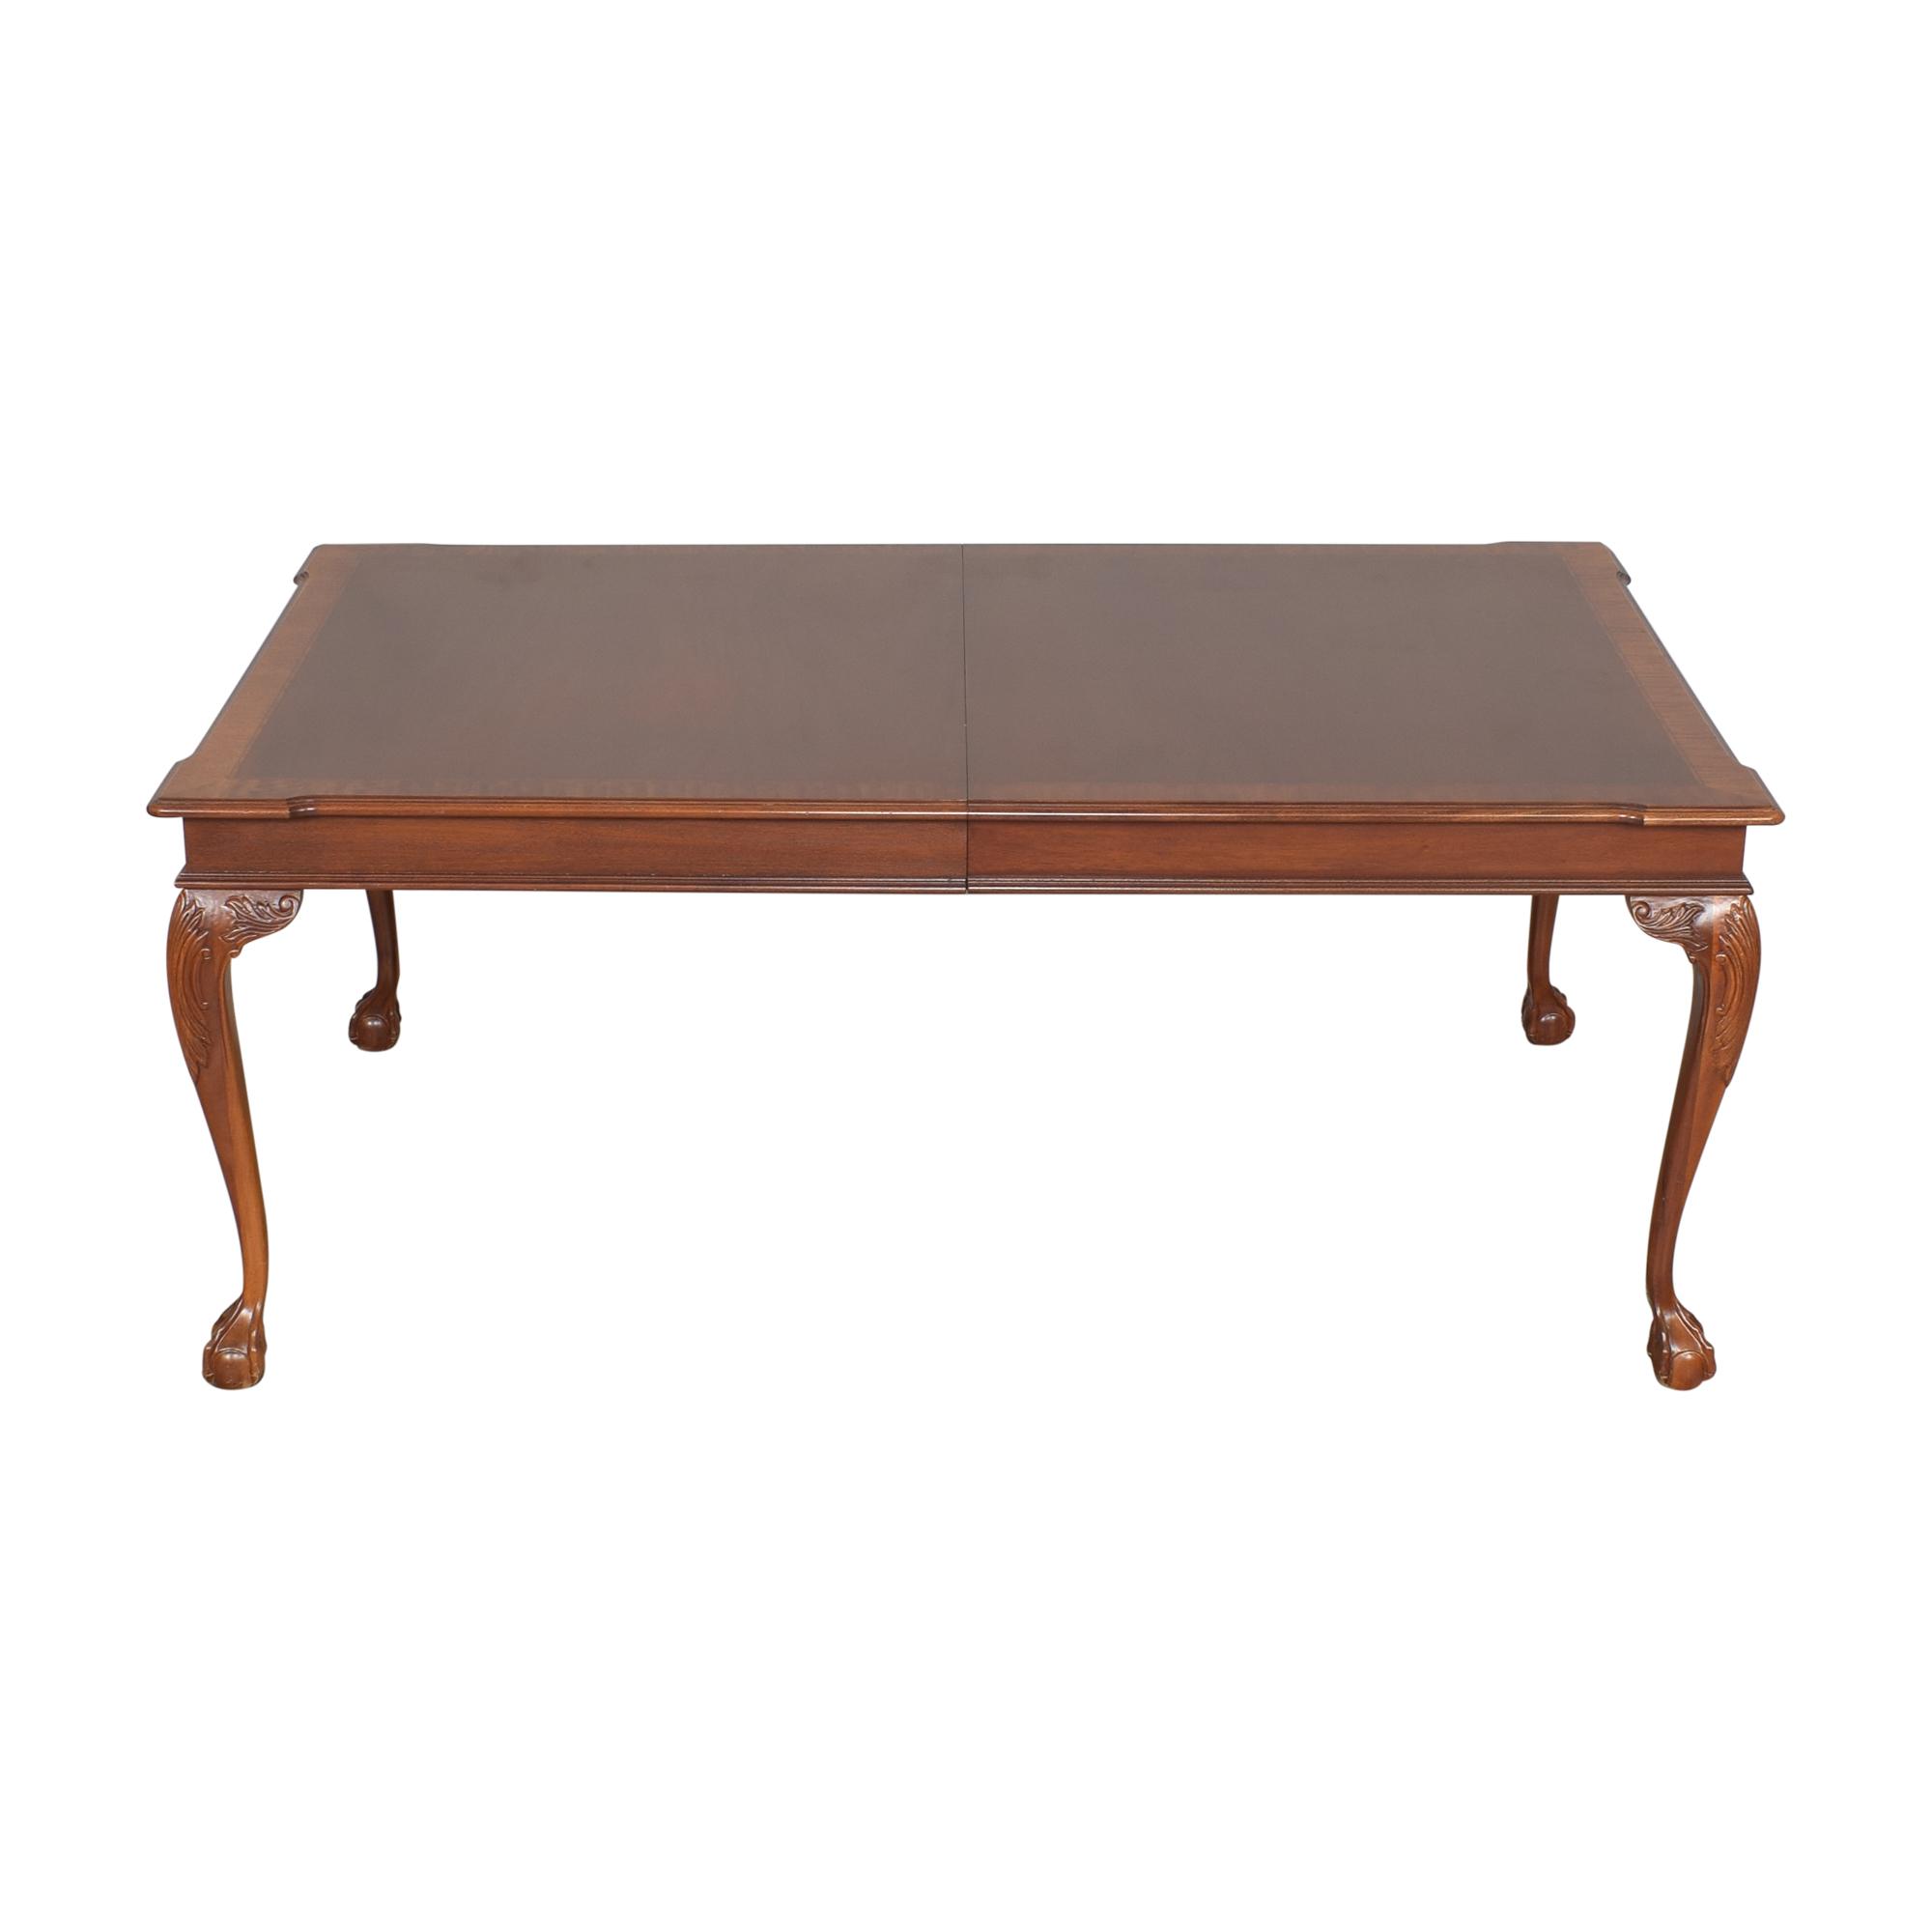 Ethan Allen Ethan Allen Extendable Dining Table on sale